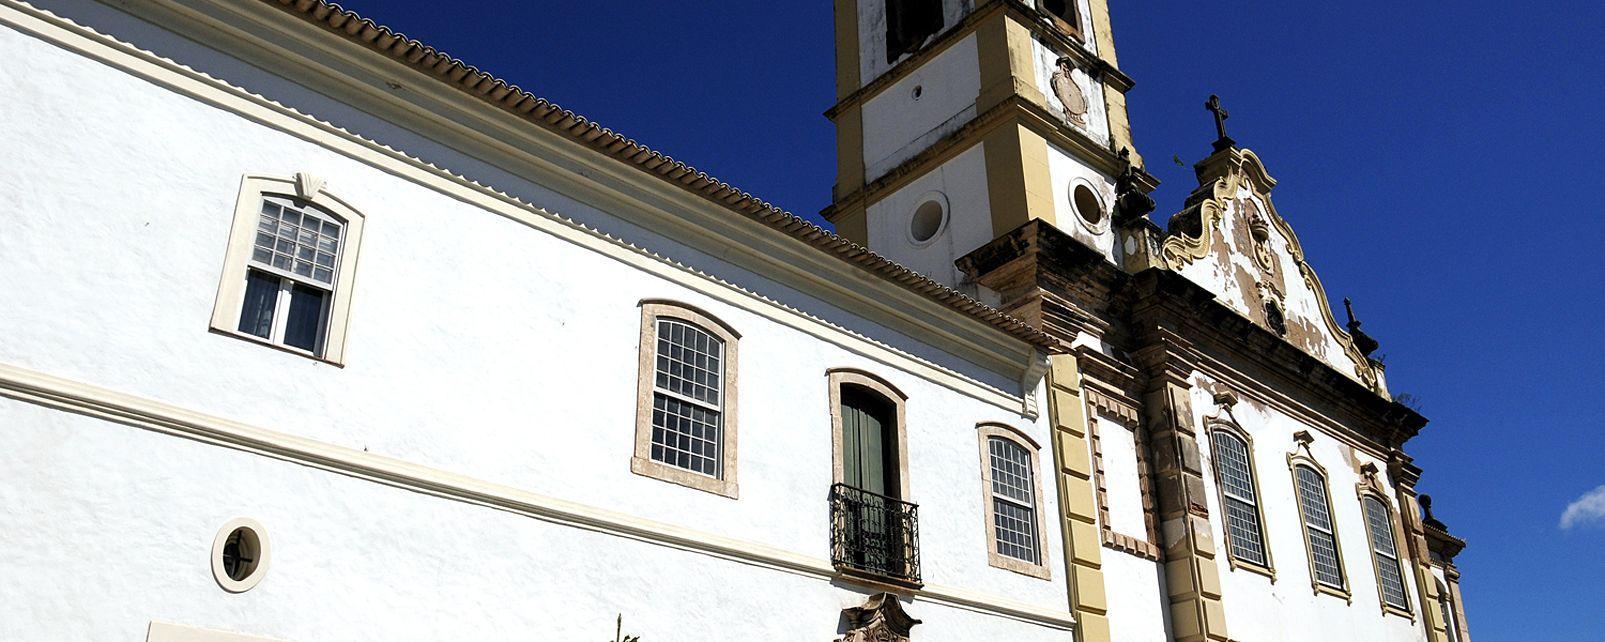 Hôtel Convento do Carmo